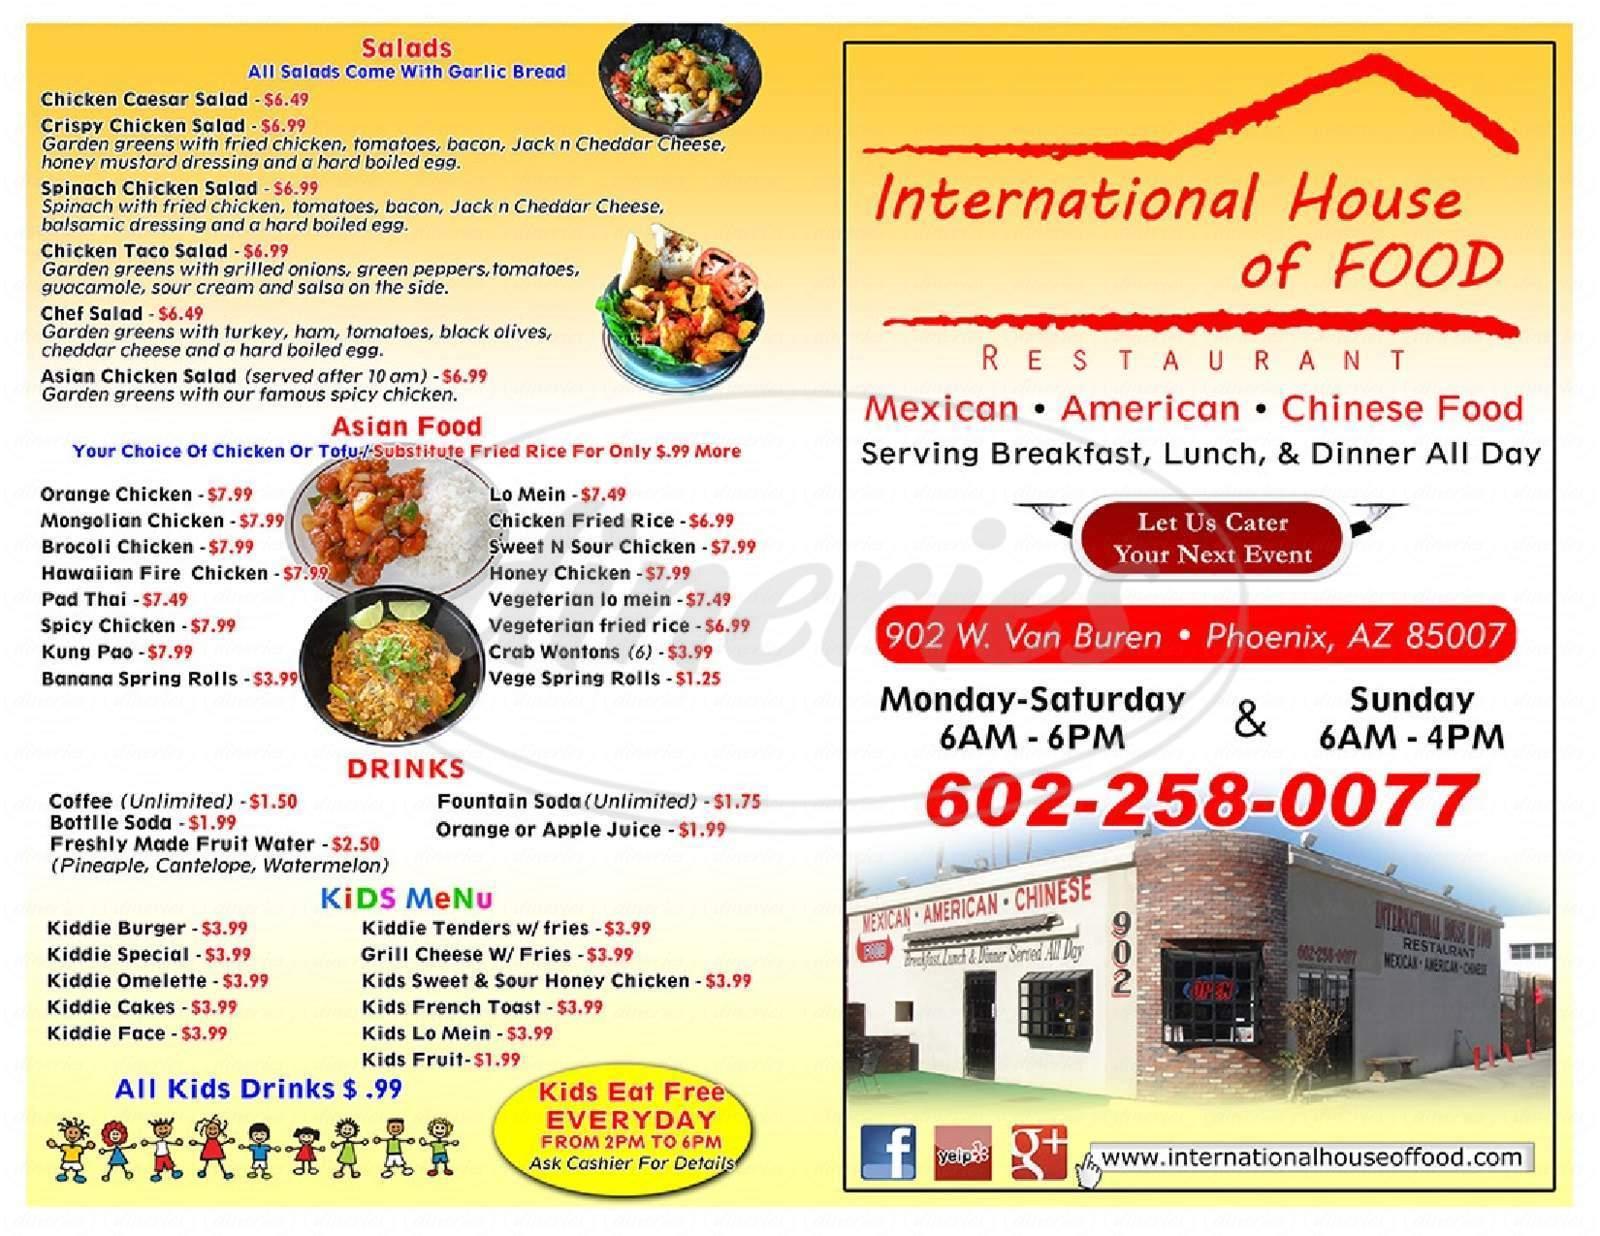 menu for International House of Food